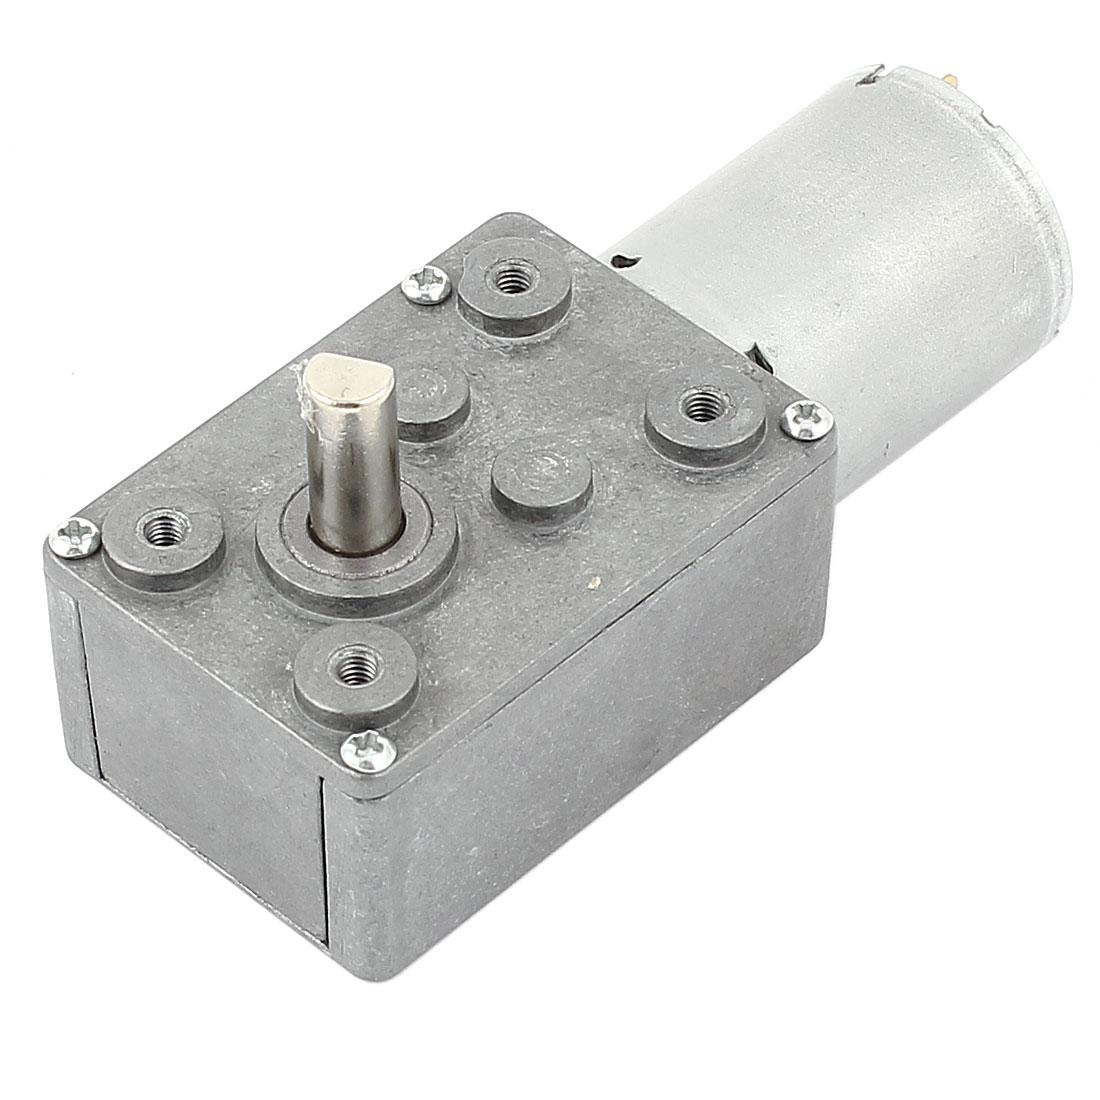 DC 12V 15RPM 6mm Shaft High Torque Turbine Worm Gear Box Reduction Motor